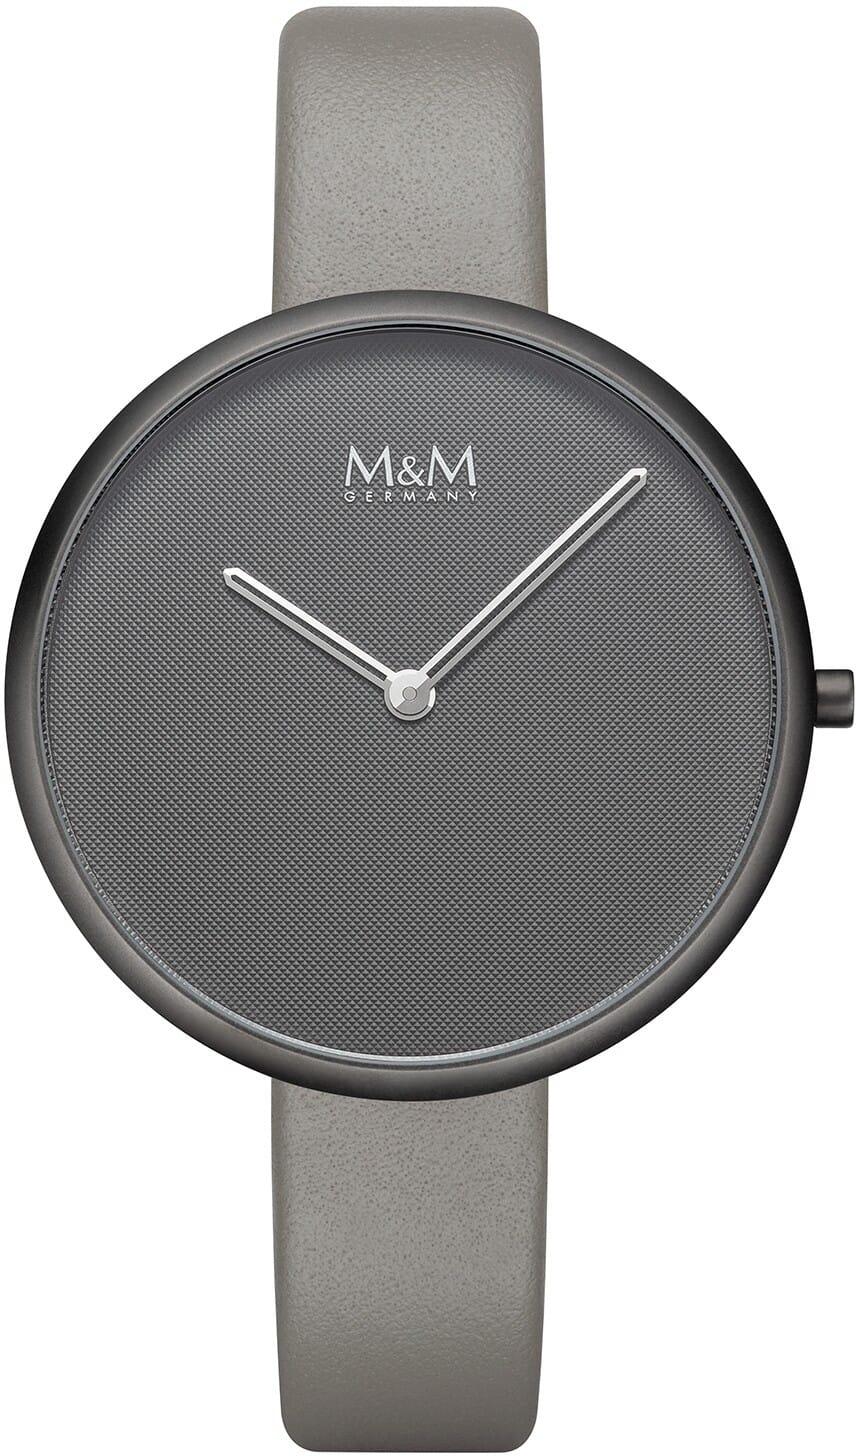 MM Germany M11954-999